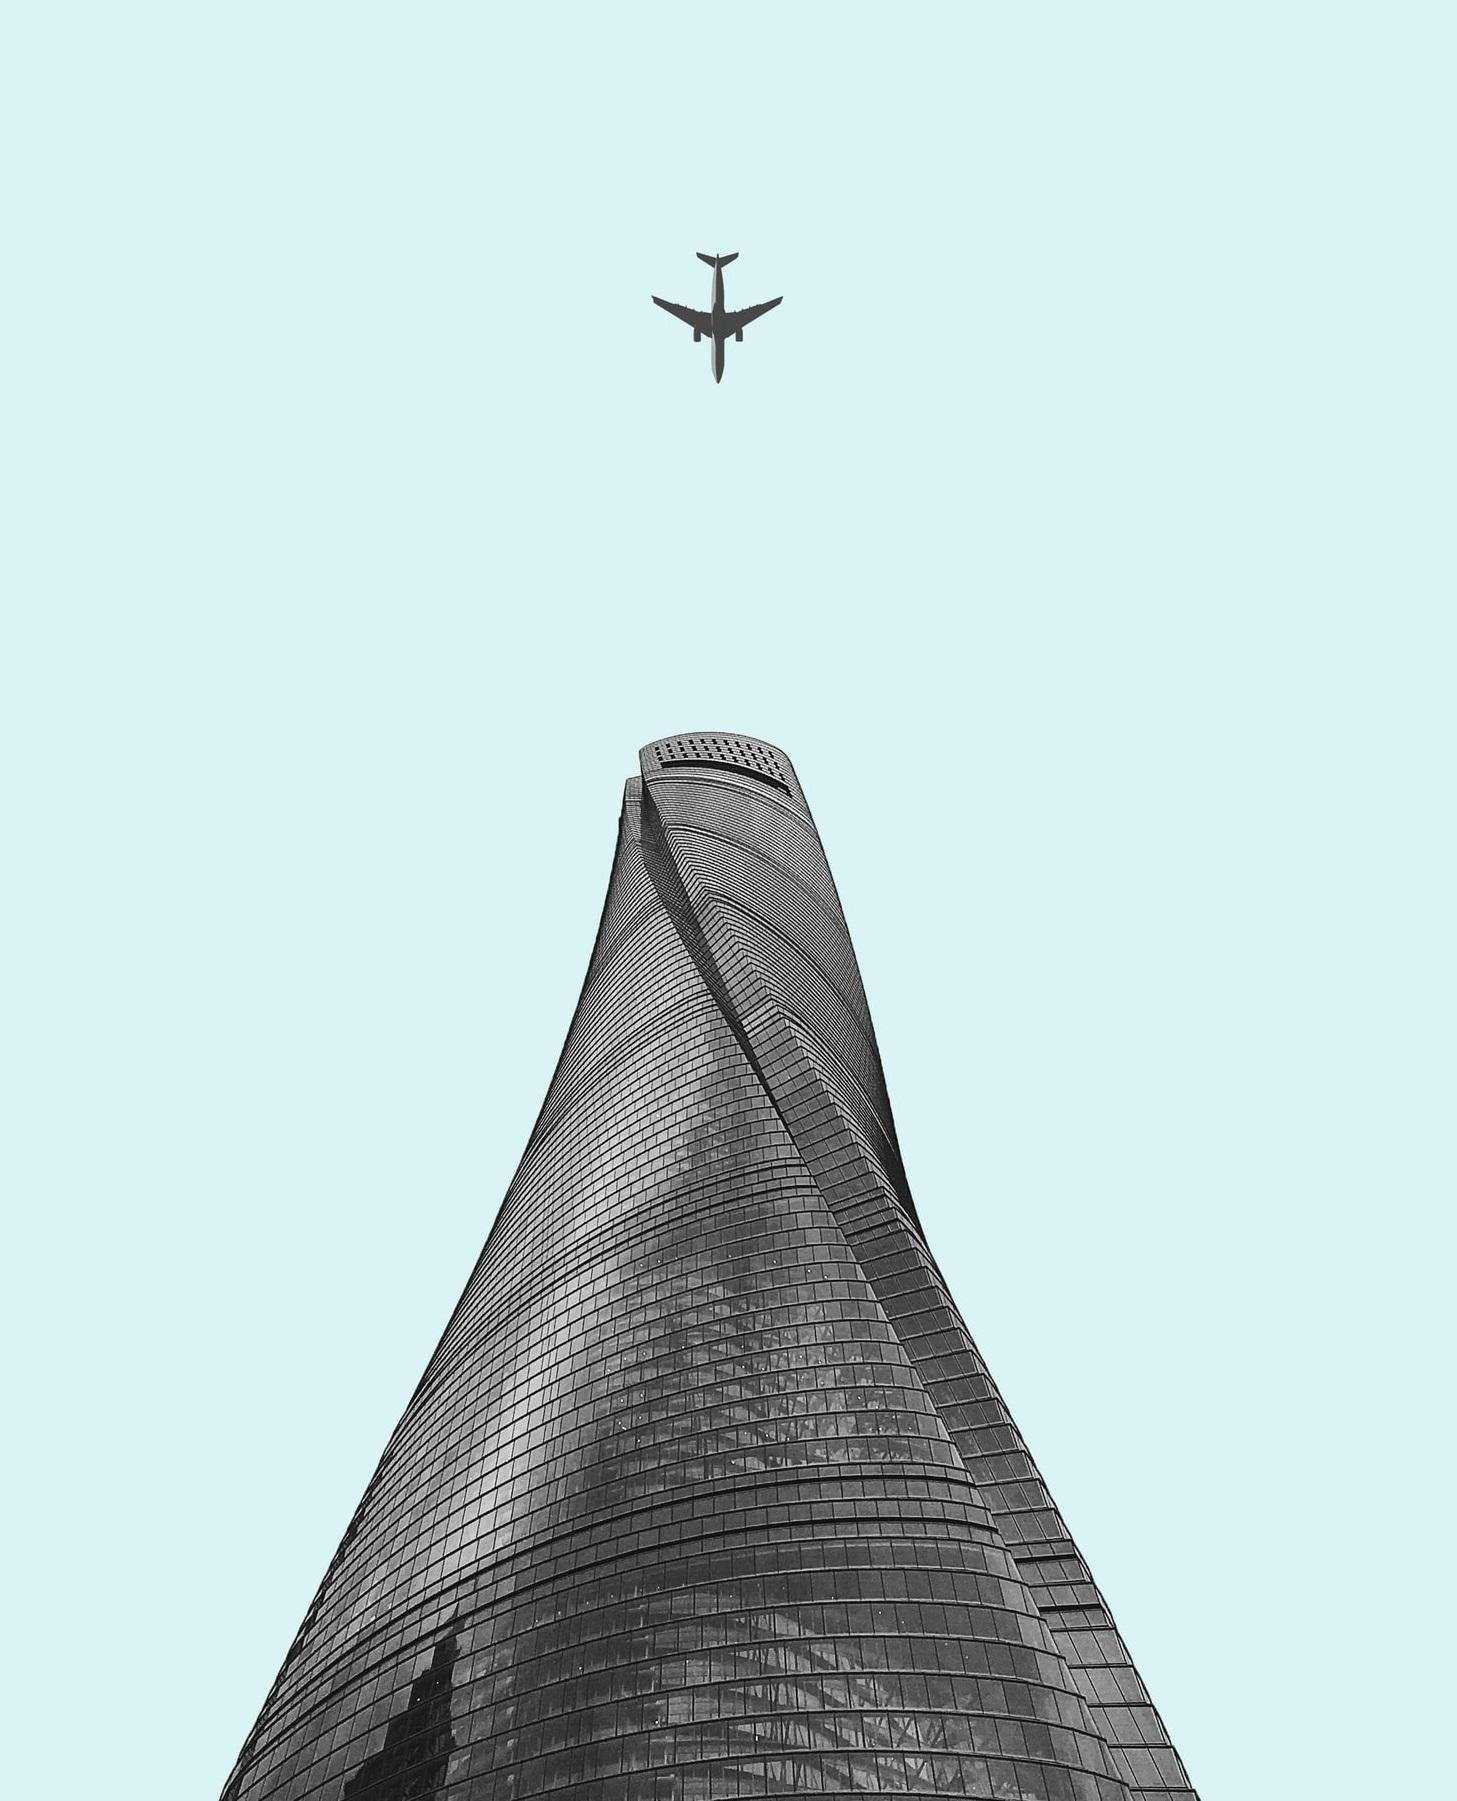 import lotniczy